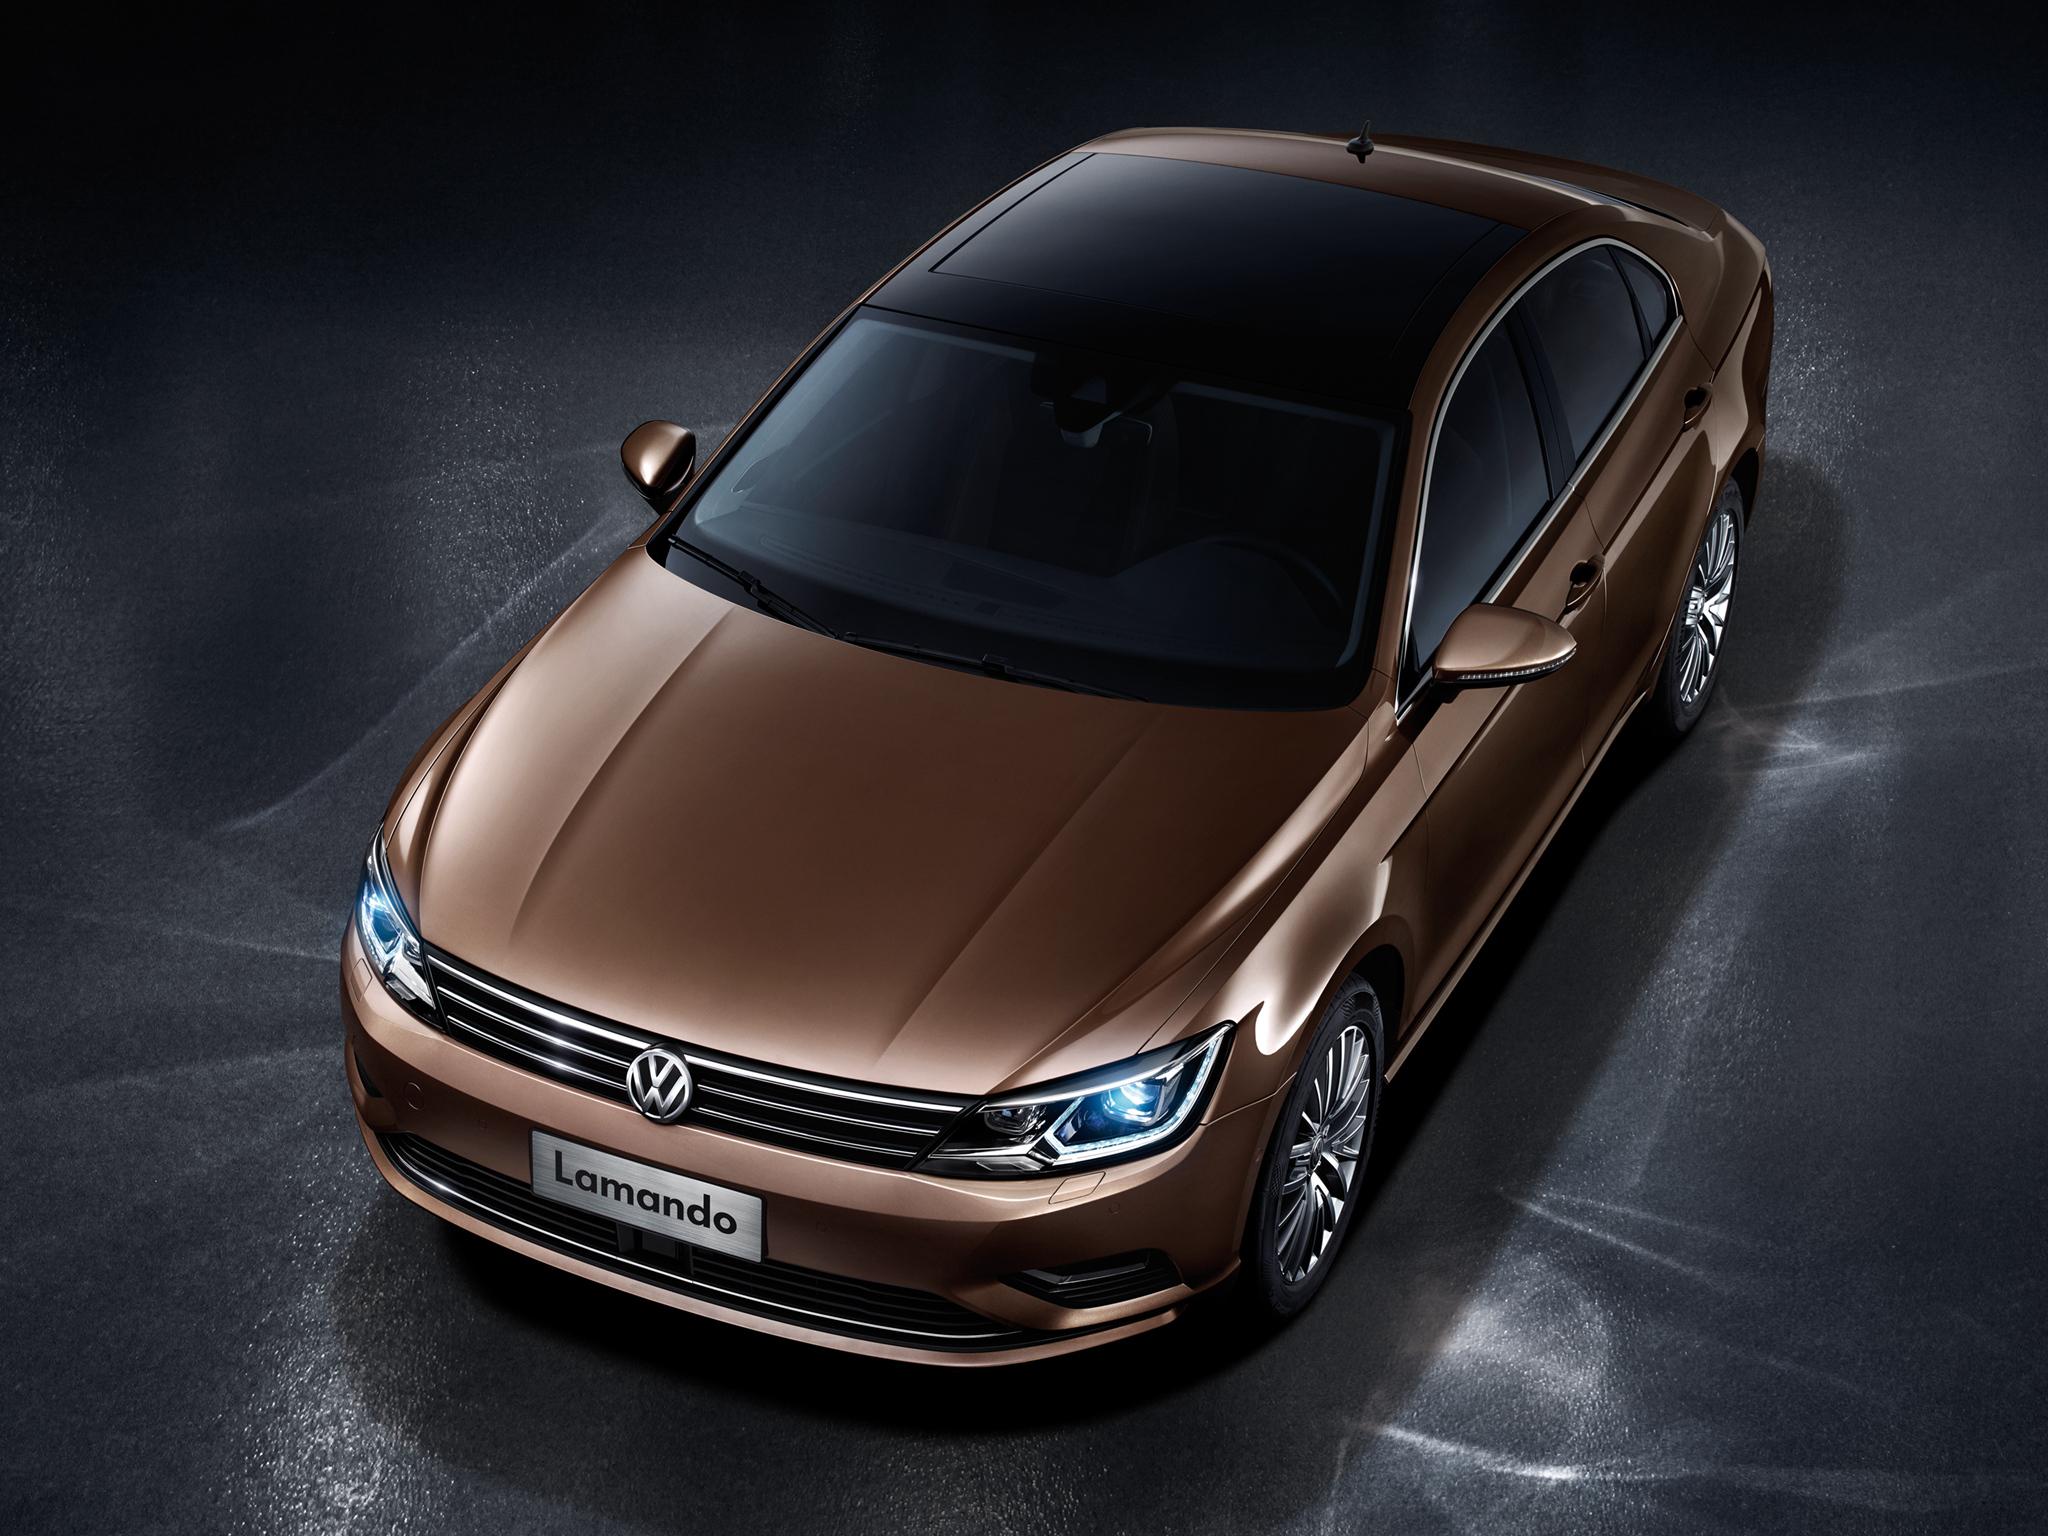 Volkswagen Lamando Four Door Coupe Officially Revealed In